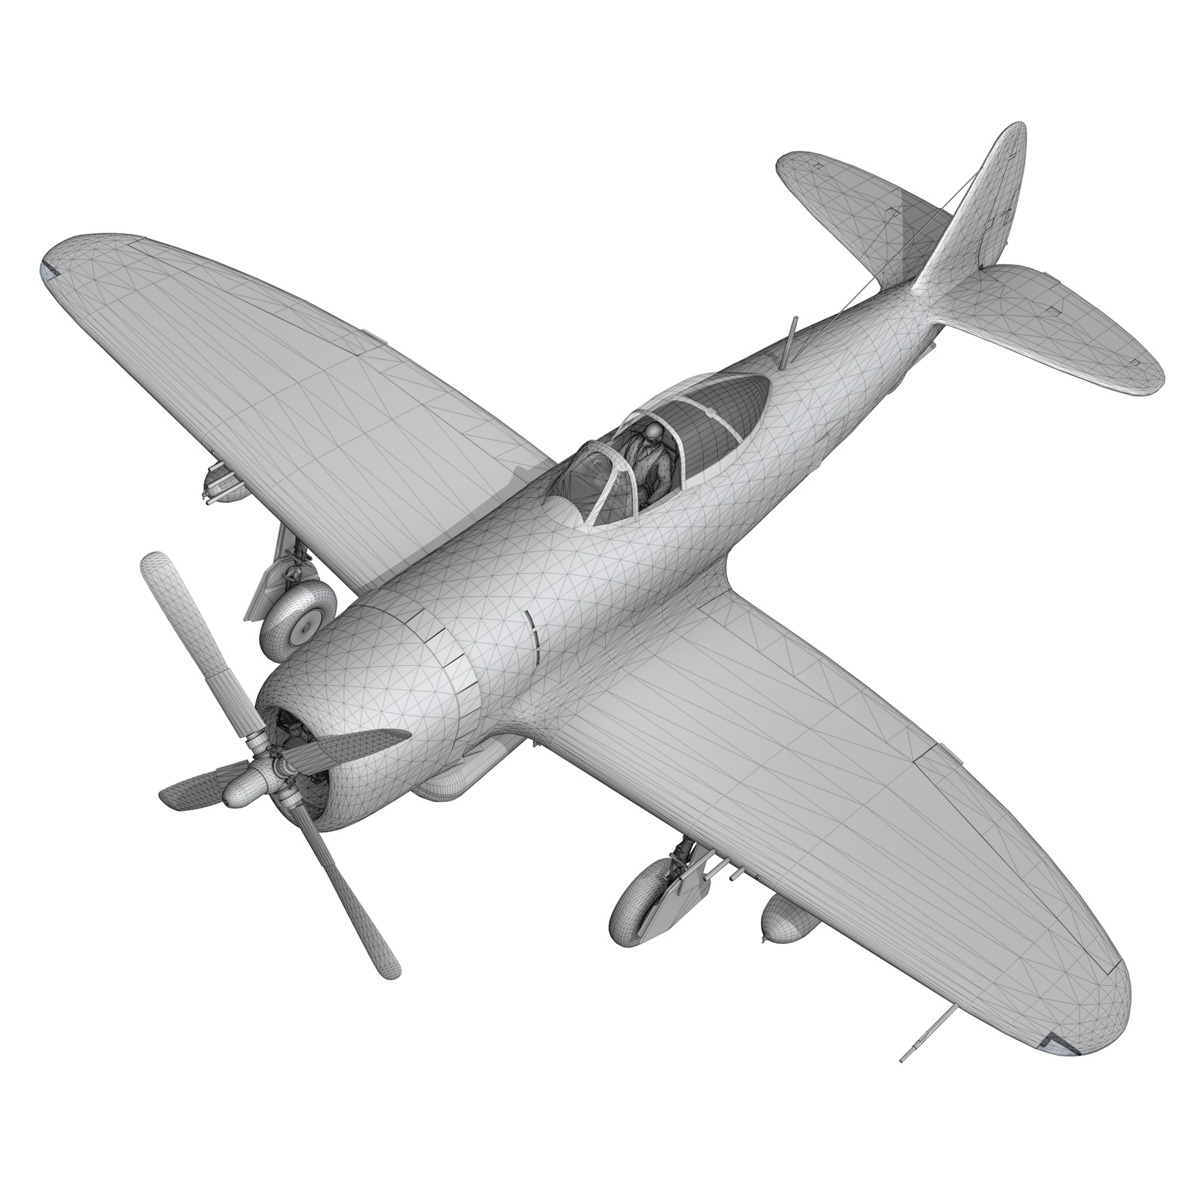 republic p-47 thunderbolt – daddy rabbit 3d model fbx c4d lwo obj 272707